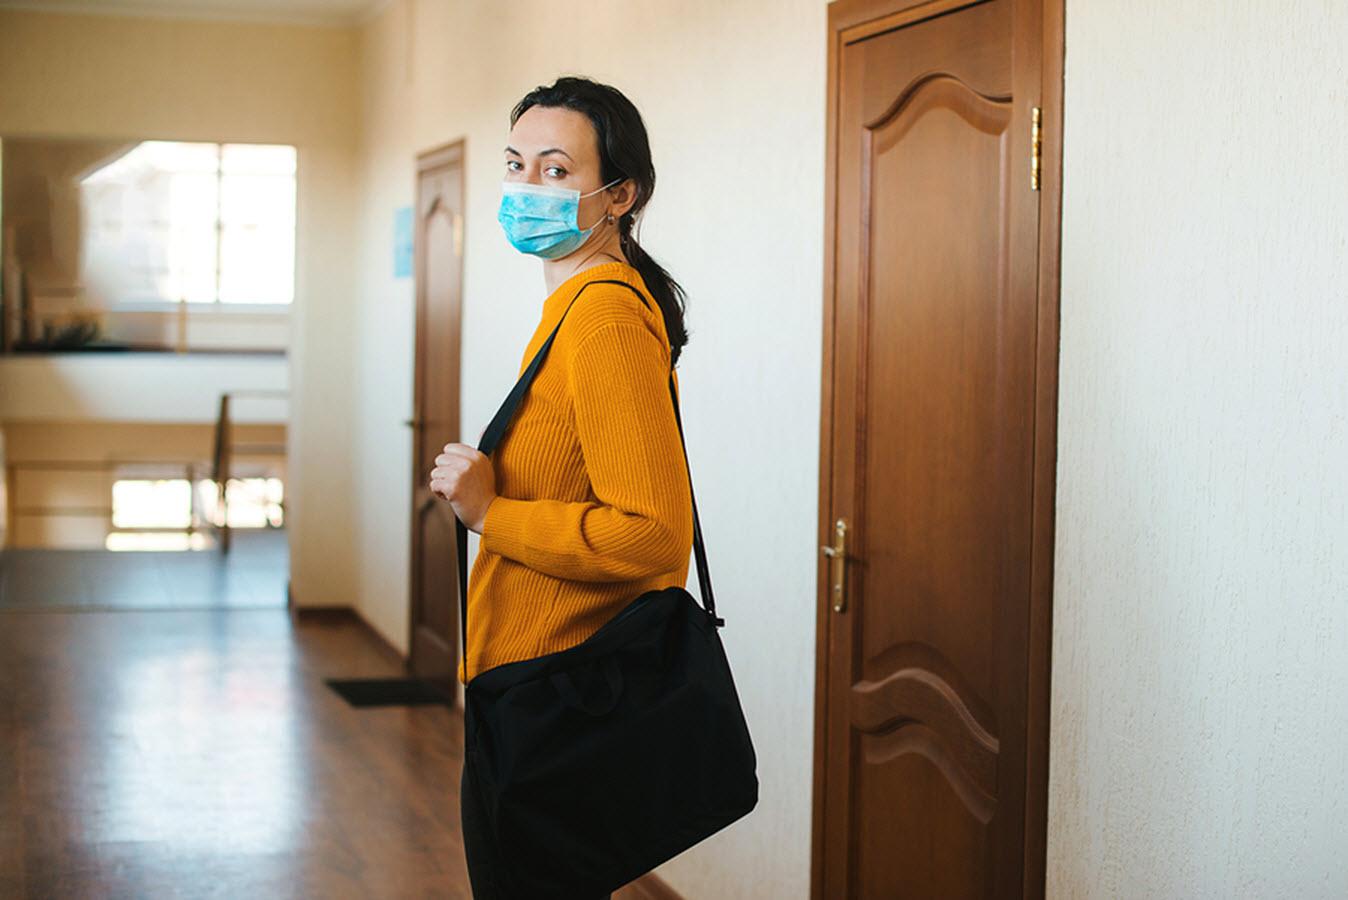 Elder Care in Surprise AZ: Wearing a Face Mask